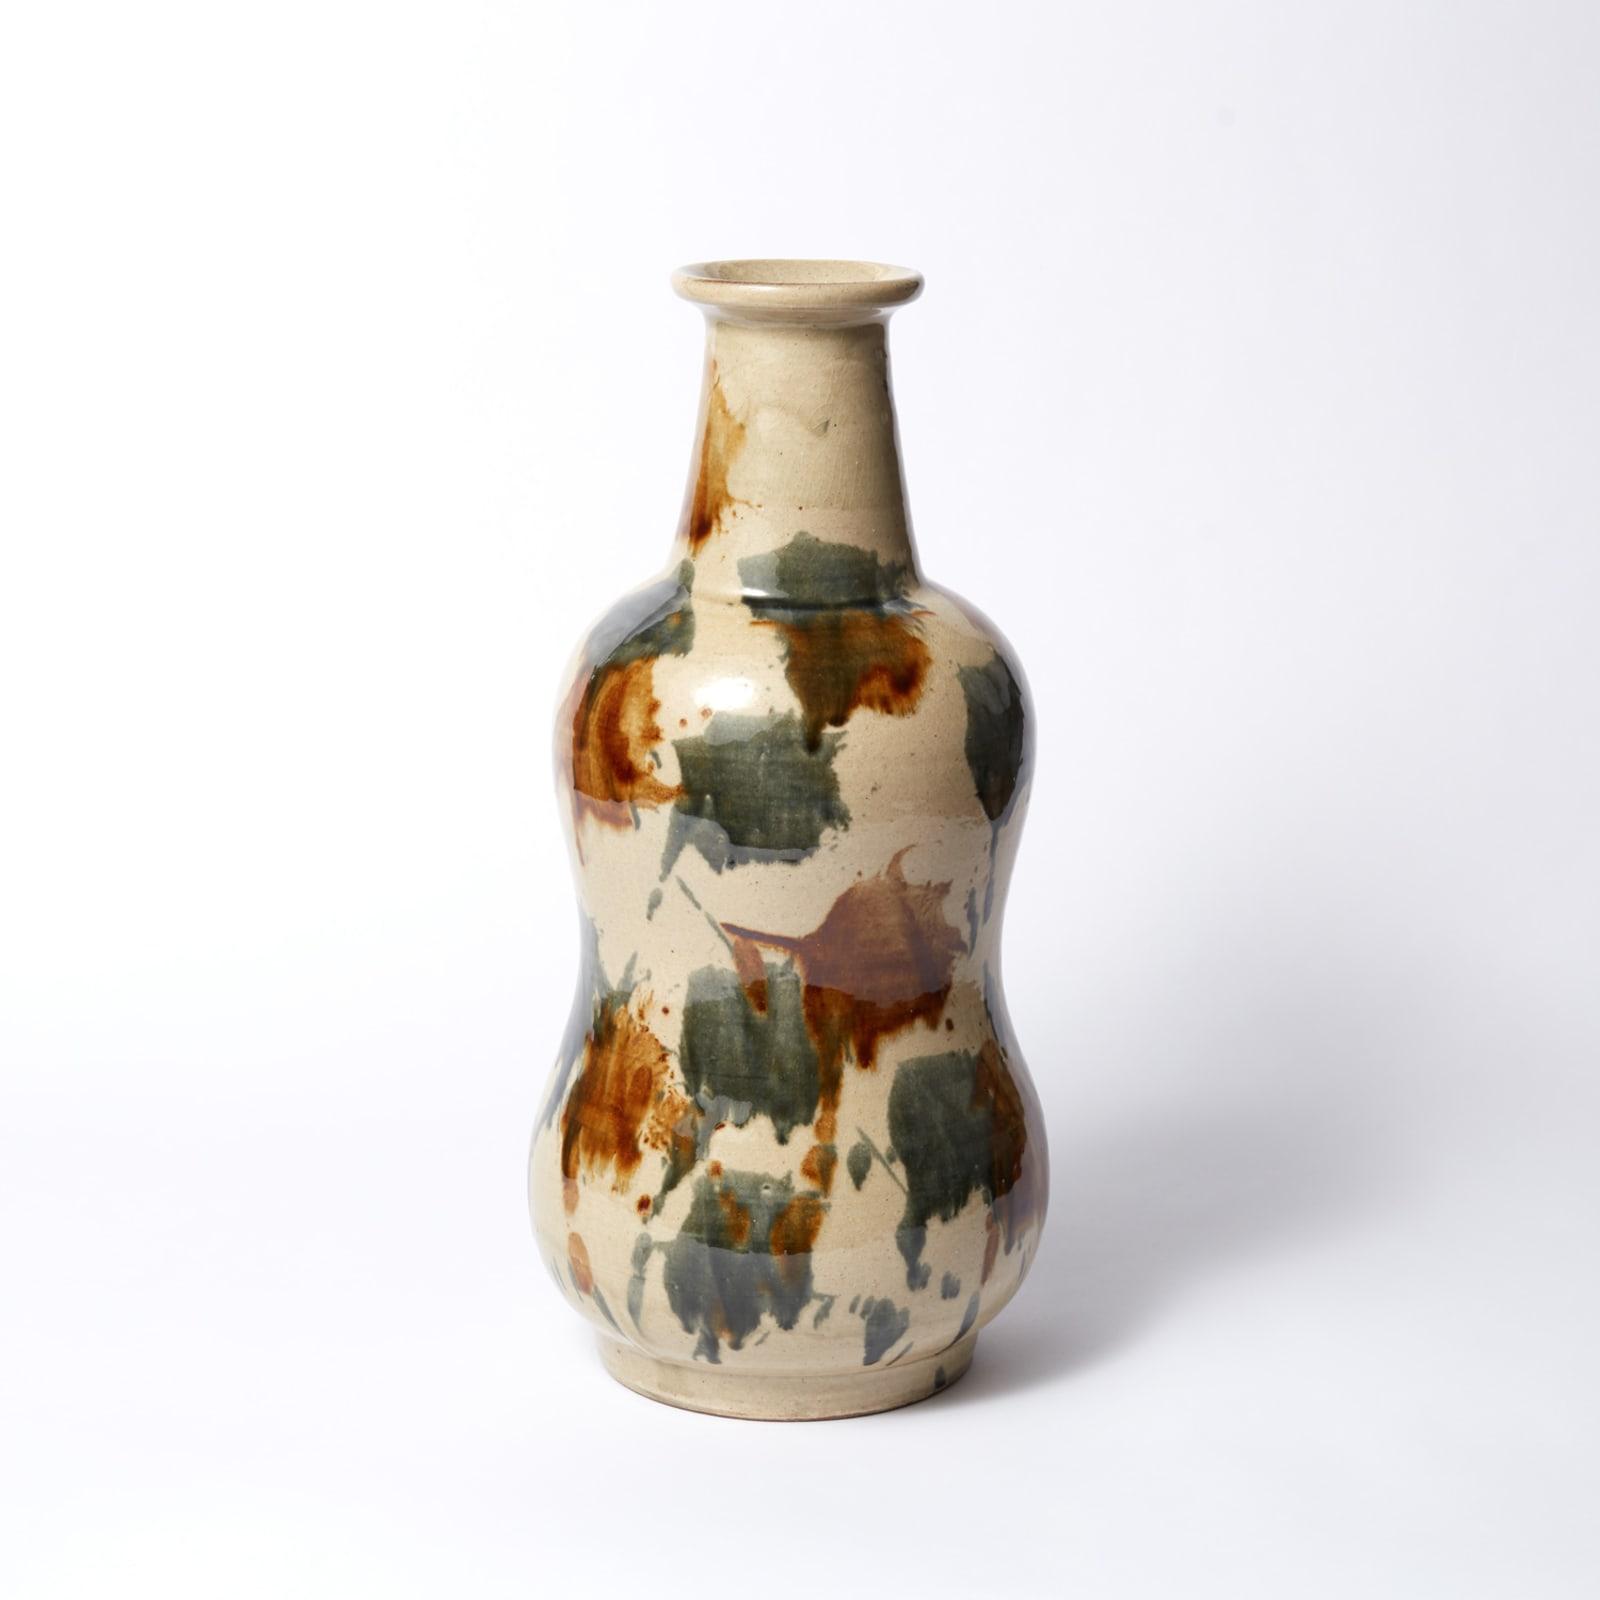 Yoneshi Matsuda  Untitled, Okinawa, 2000  Glazed ceramic  45 x 19 x 19 cm